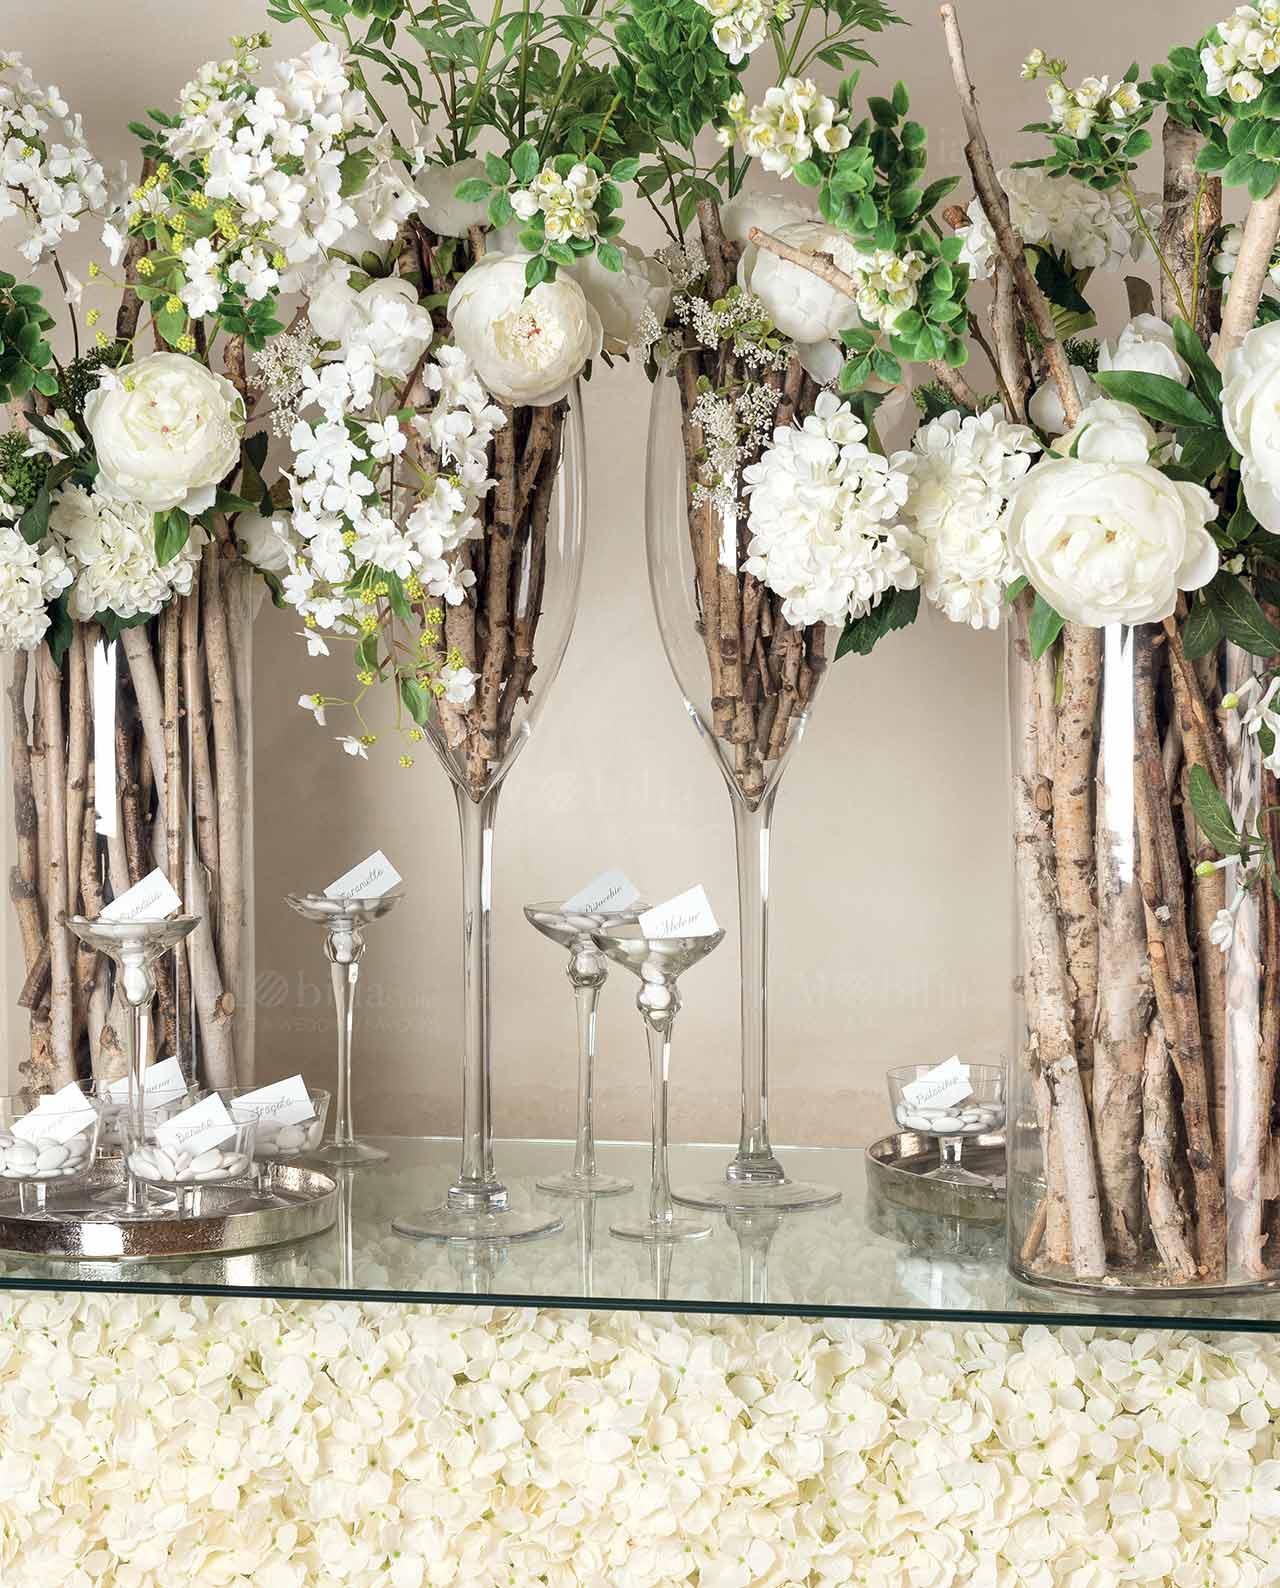 Addobbi Floreali Matrimonio Rustico : Tendenze addobbi floreali matrimonio novità e sconti